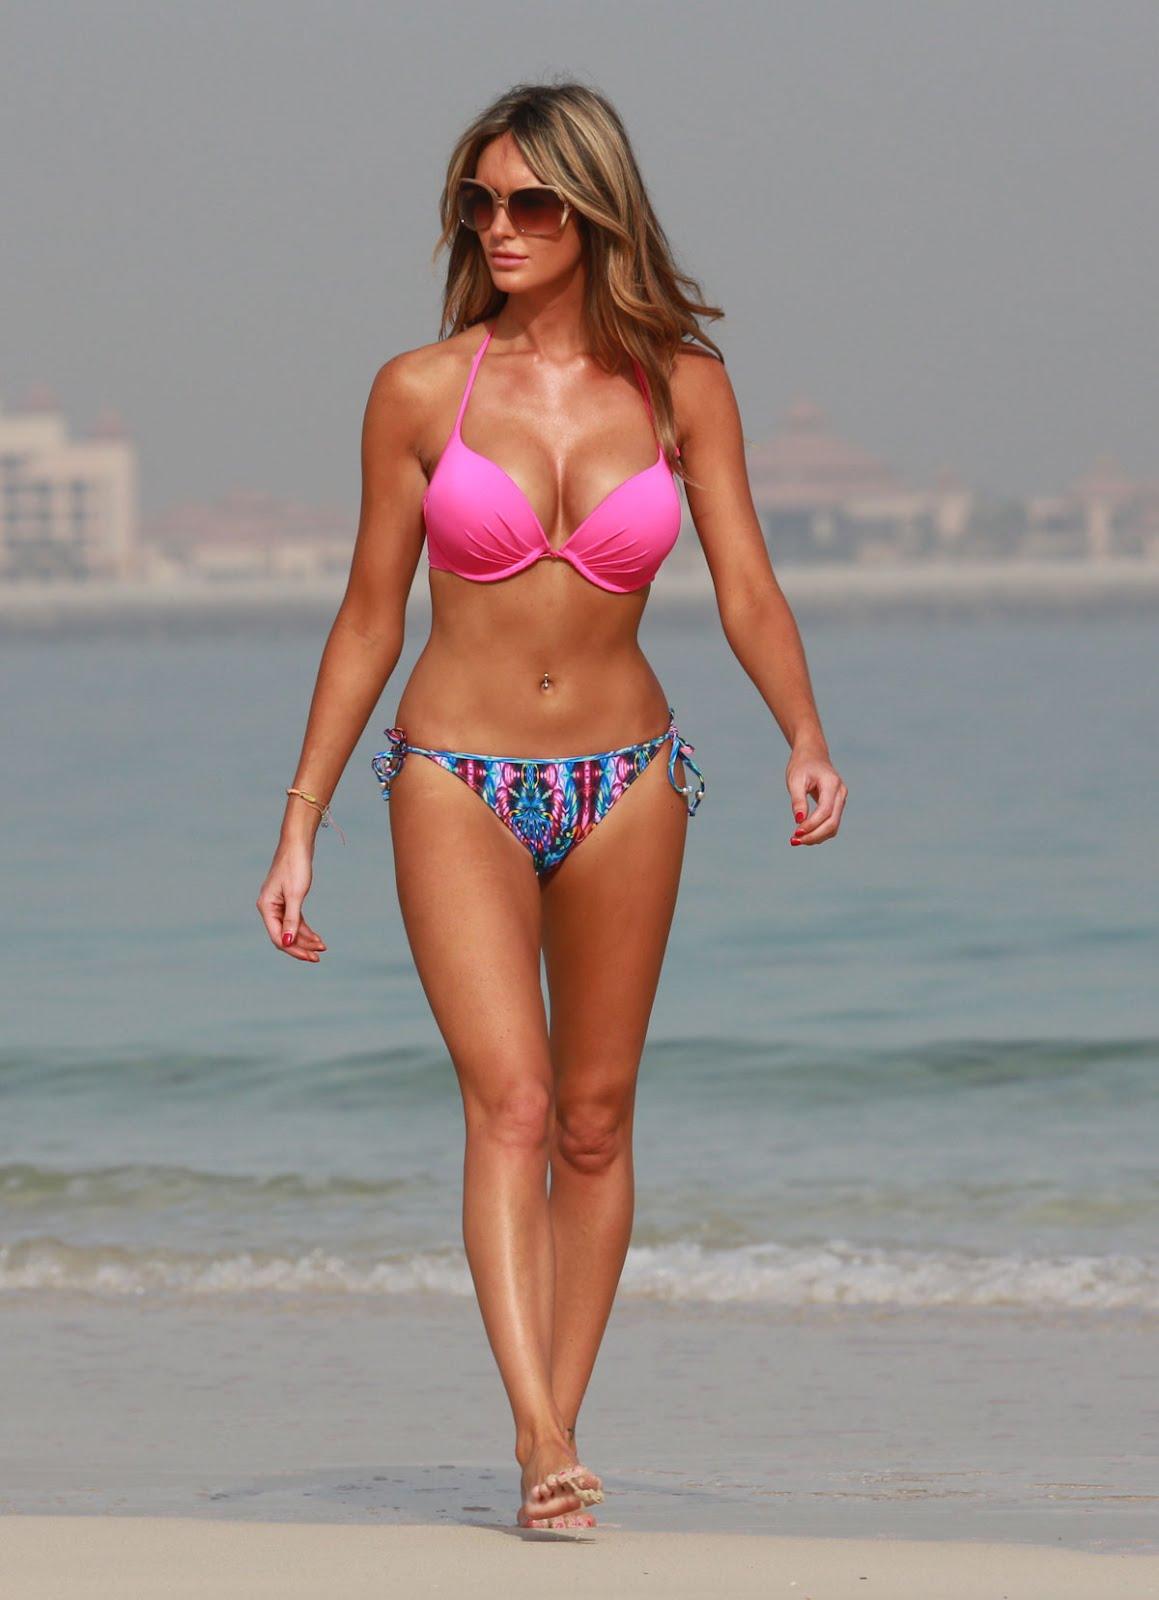 http://3.bp.blogspot.com/-DD0dQgKzV7U/T_Hx9G17-CI/AAAAAAAAHso/qHd5AKjTjjY/s1600/GEORGINA-DORSETT-in-Bikini-on-the-Beach-in-Dubai-12.jpg